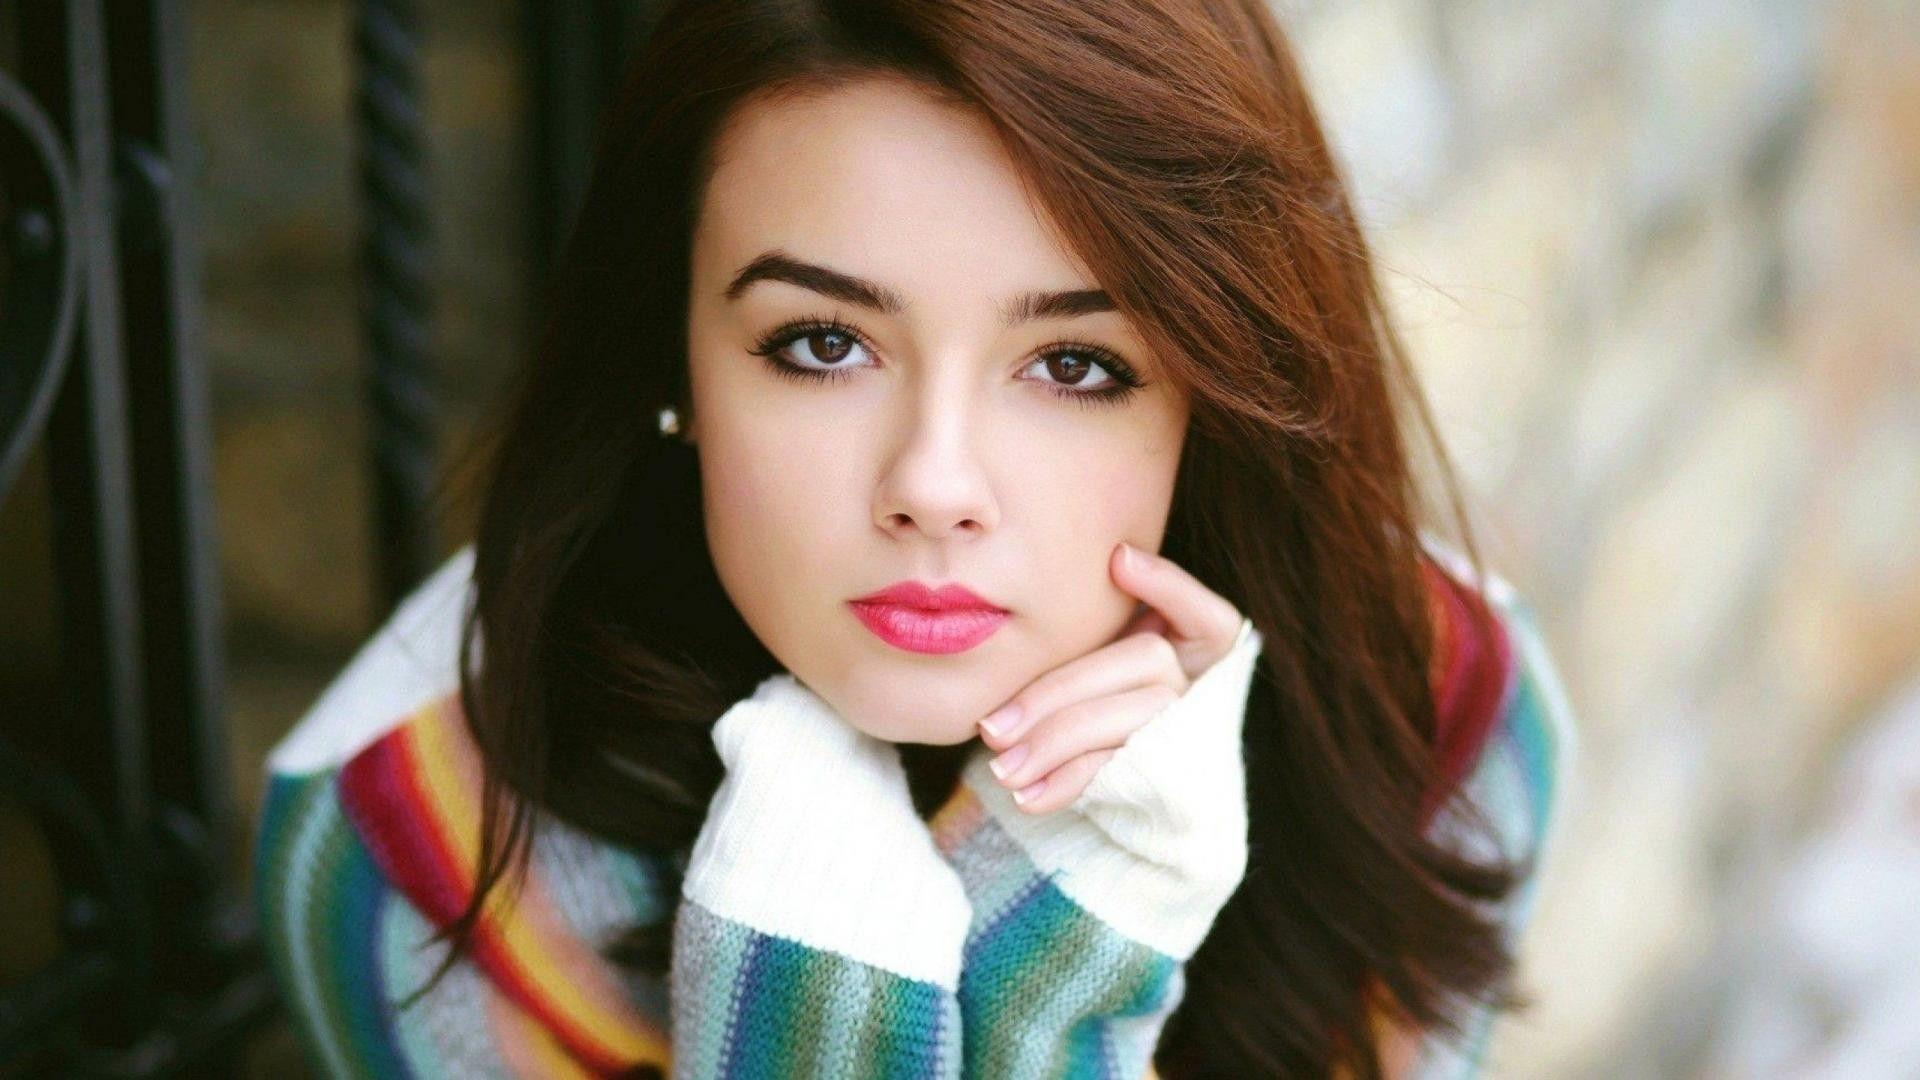 OLLIE: Beautiful girl free download